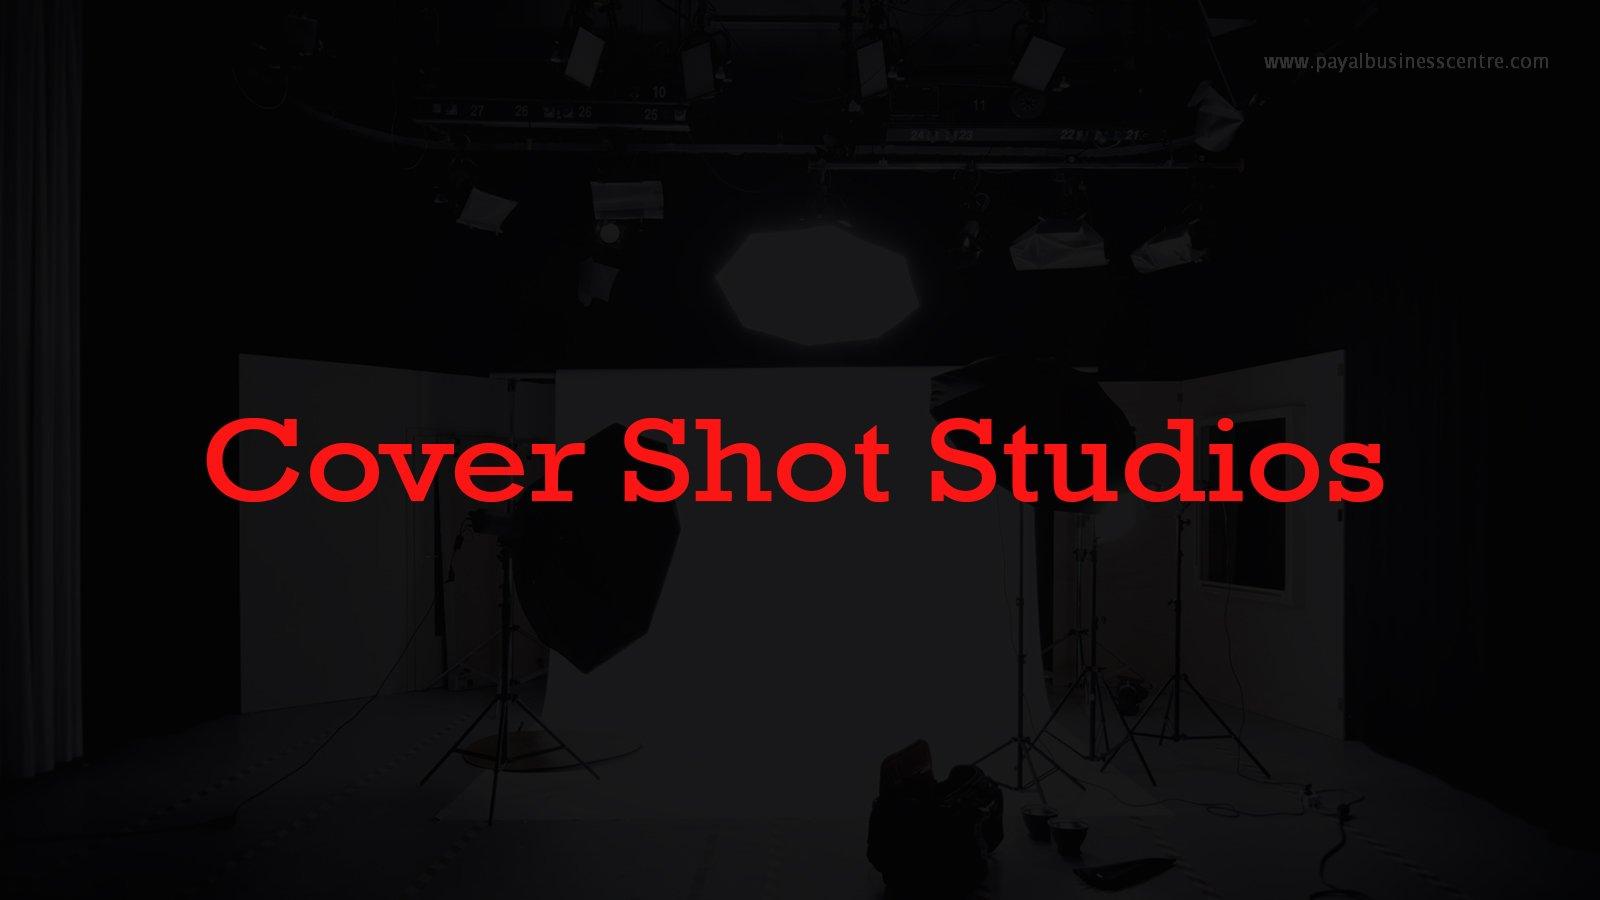 Cover Shot Studios